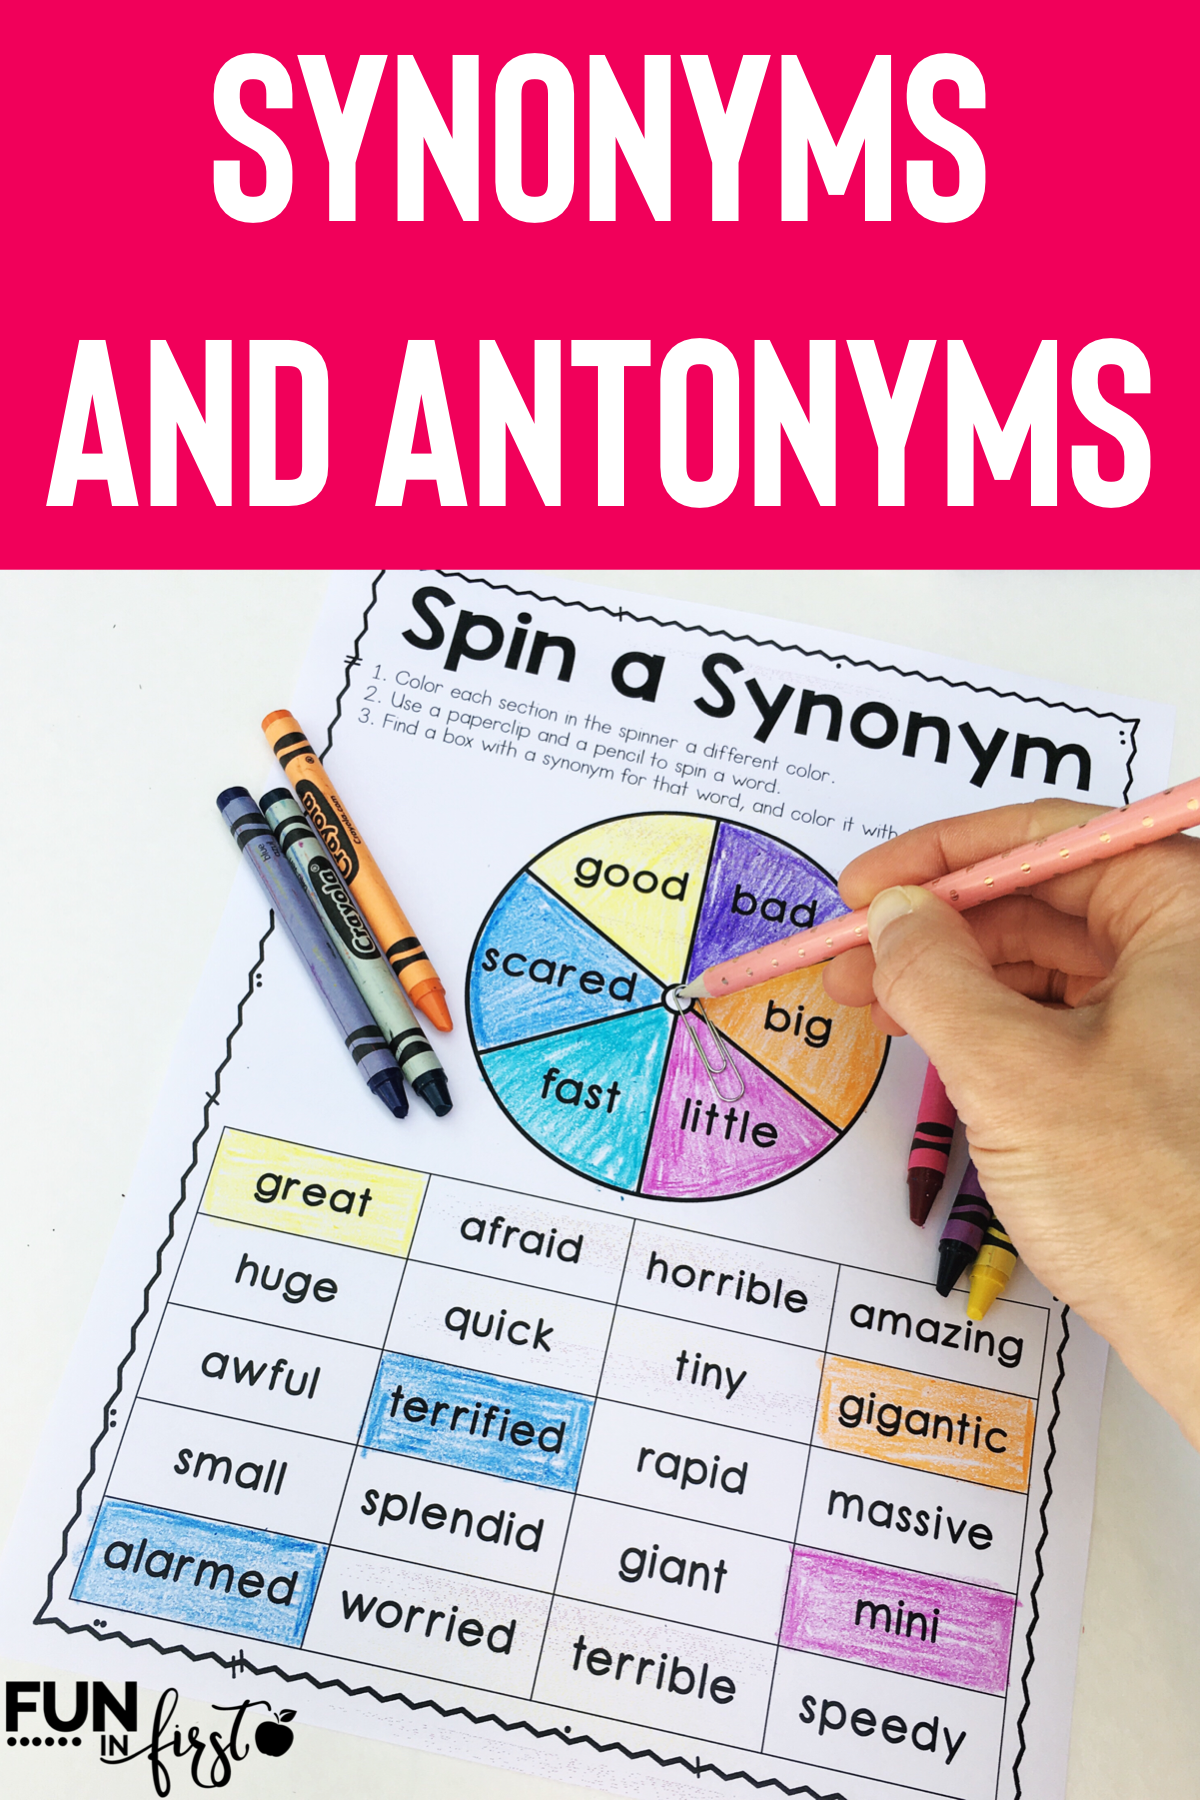 Synonym And Antonym Activity Pack Antonyms Activities Teaching Synonyms Synonym And Antonym Activities